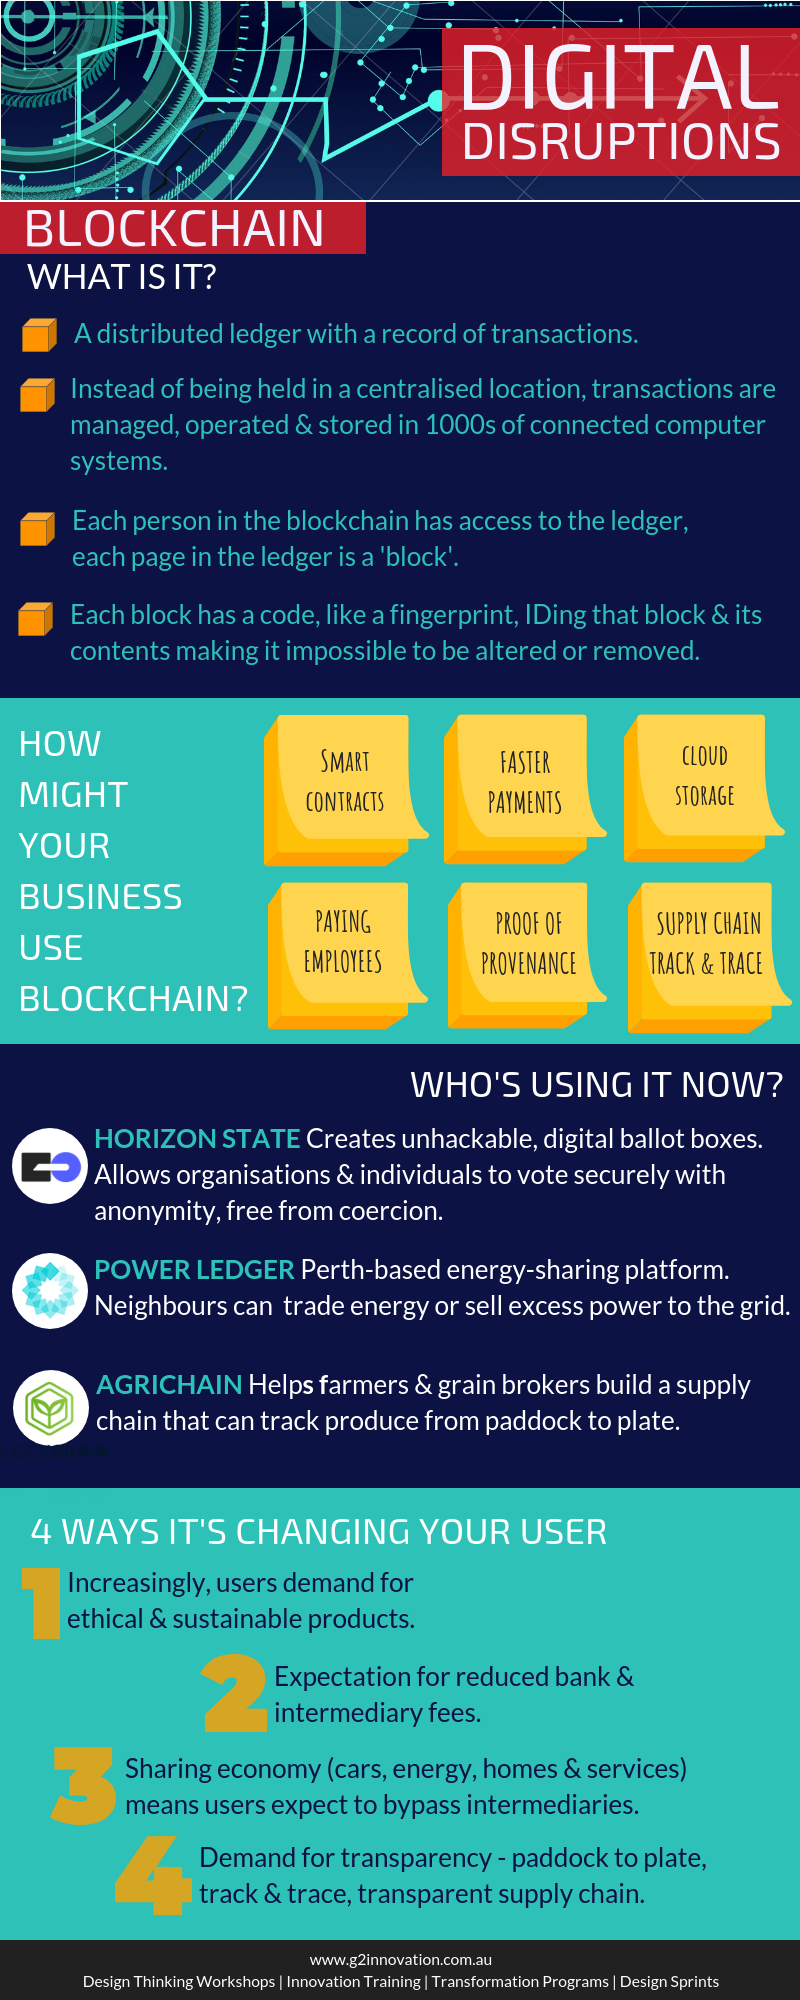 Digital-Disruptions-Blockchain_G2-Innovation.png